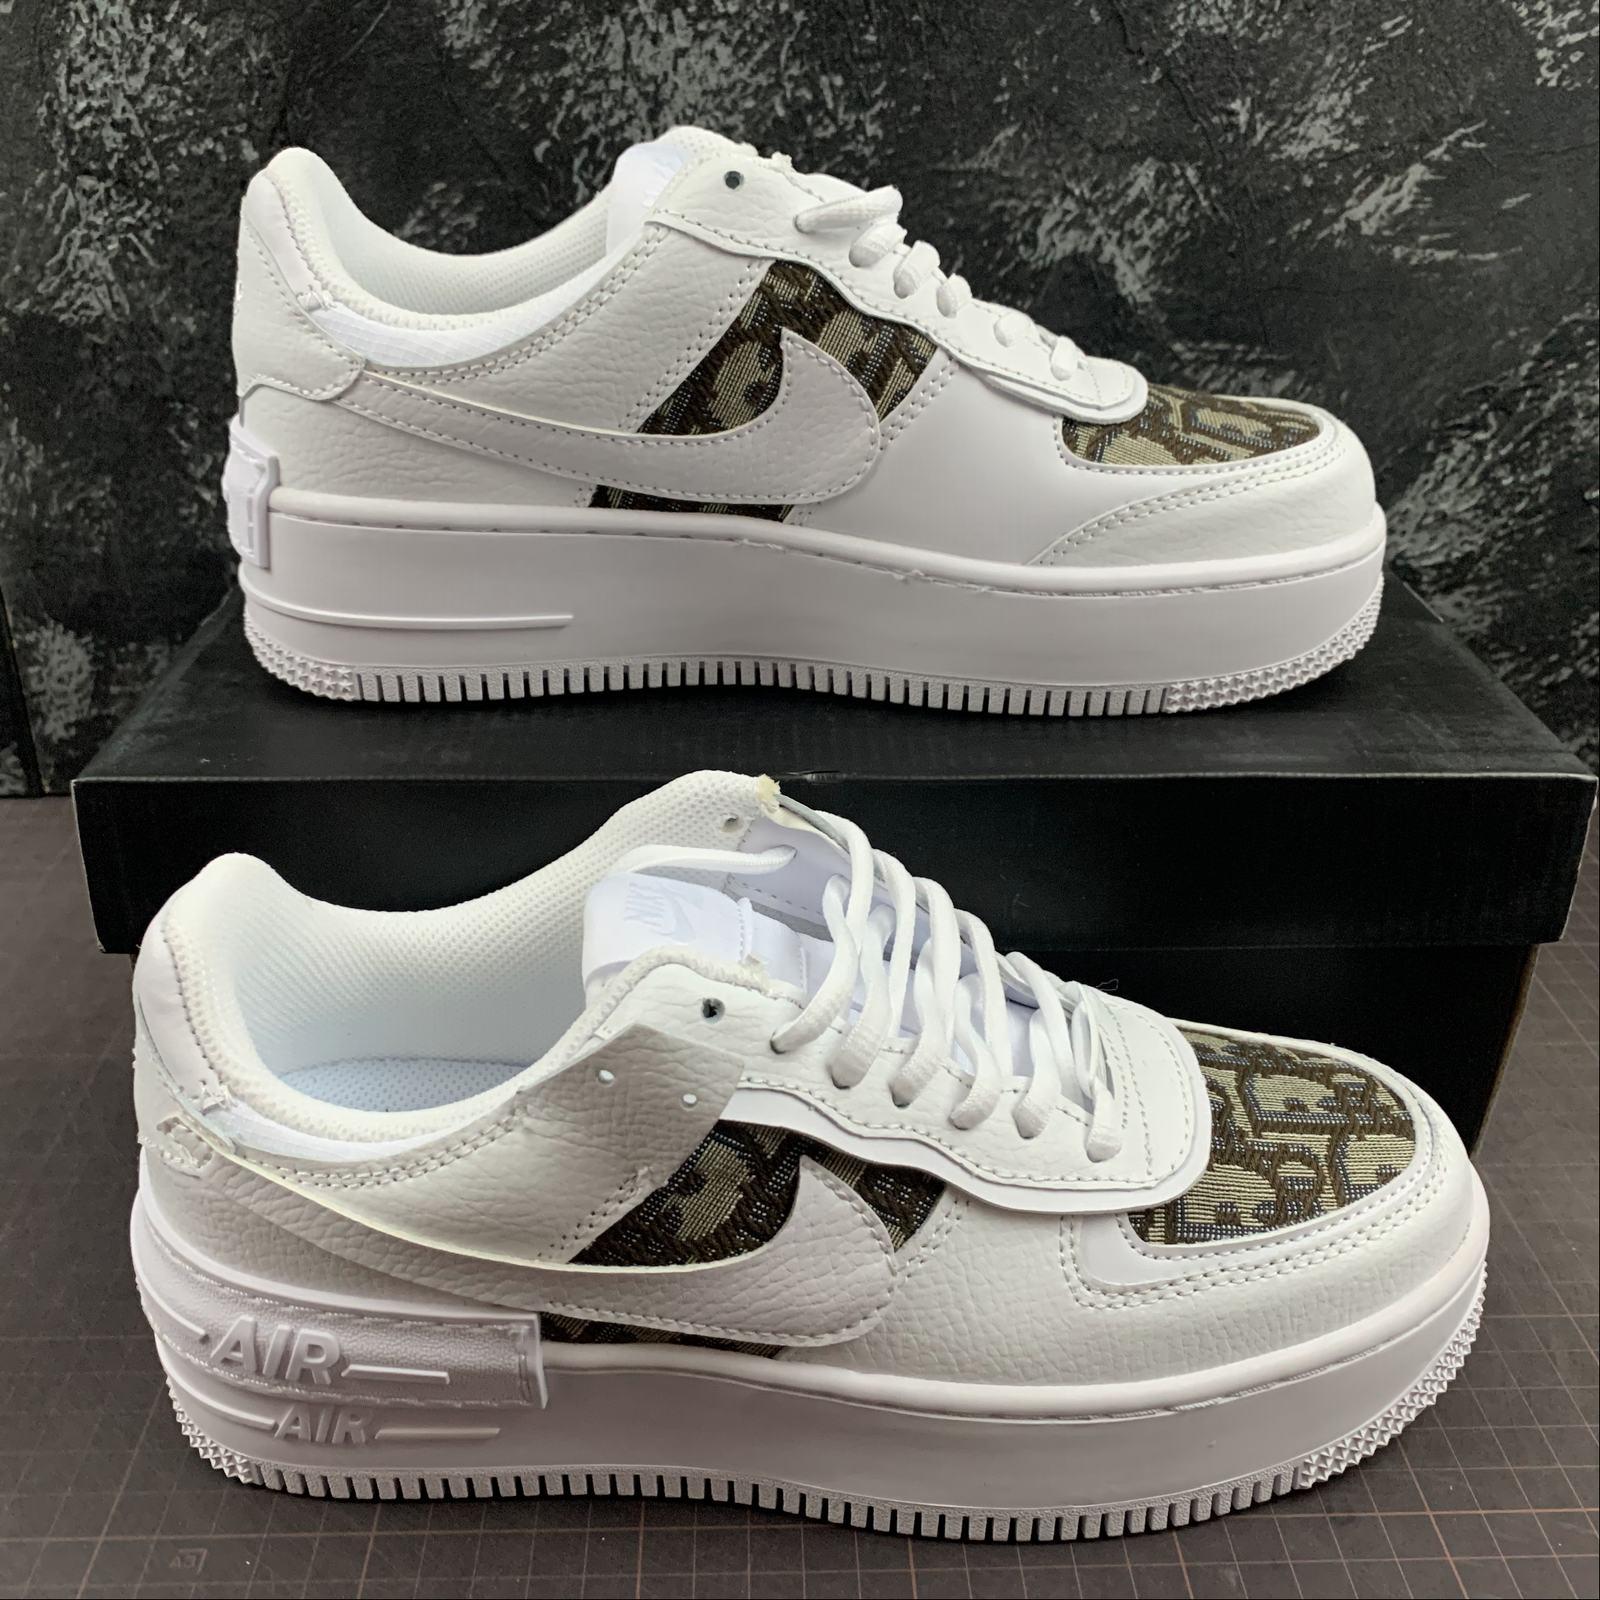 Nike Air Force 1 Shadow White Khaki Footzonespain Nike air force 1 low. nike air force 1 shadow white khaki